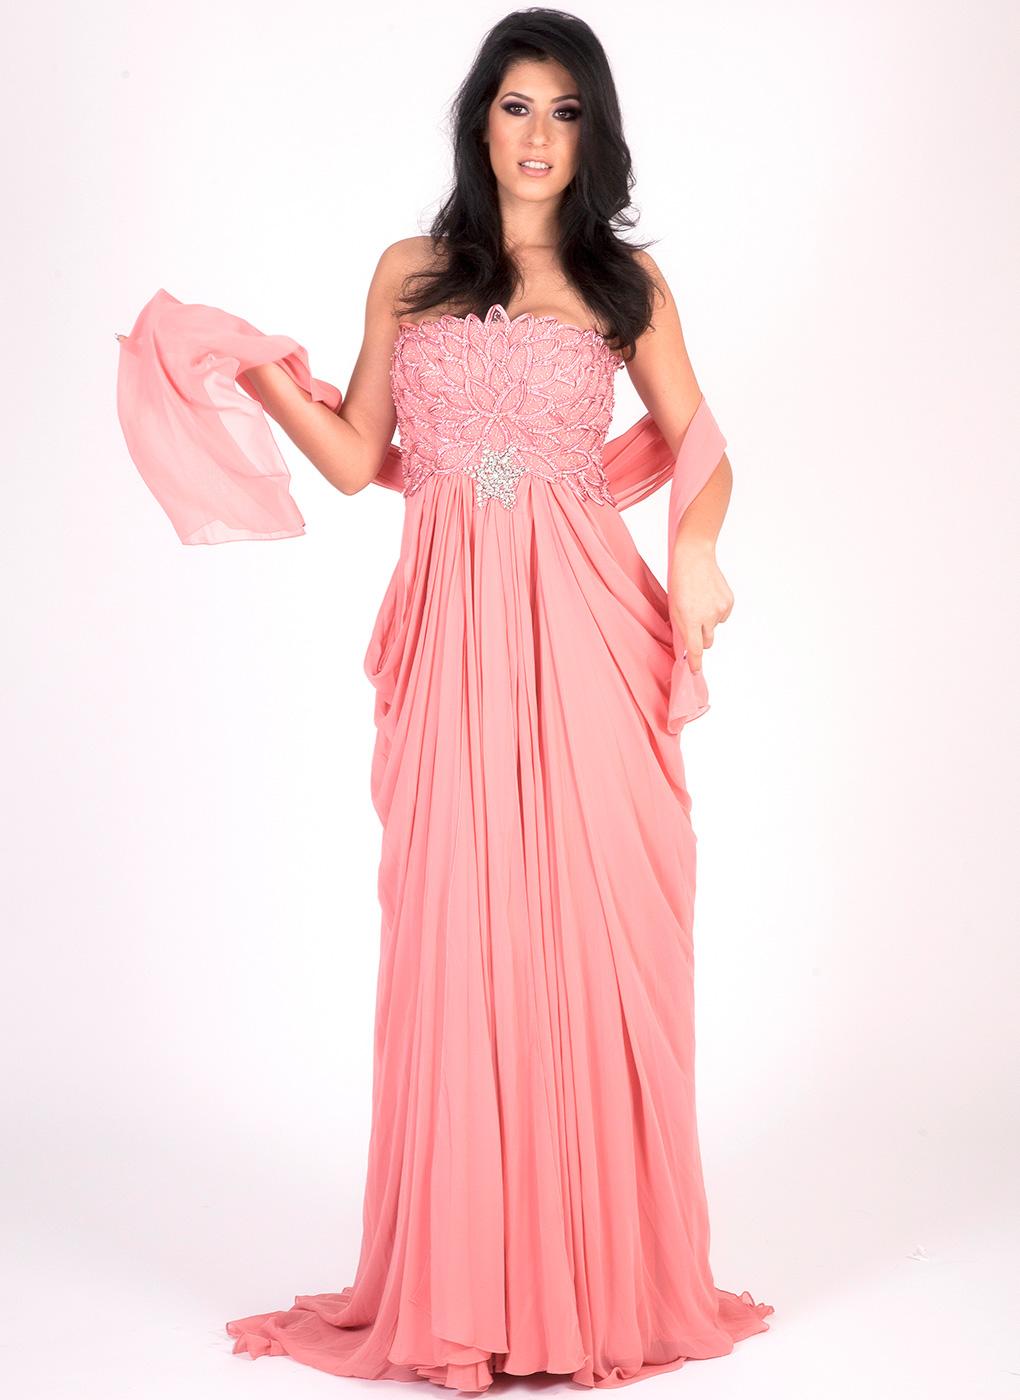 rochie de seara ,rochii de seara, rochie seara, rochii seara, rochie de seara super, rochie de seara eleganta, rochii de seara elegante, rochie de seara superba, rochii de seara superbe, rochie de seara sexy, rochii de seara sexy, rochie de seara albastra, rochii de seara albastre, rochie de seara tip sirena, rochii de seara tip sirena, rochie seara tip sirena, rochie seara sirena, rochie convenabila, rochii de seara convenabile, rochie de seara avantajoasa, rochii de seara avantajoase, rochie de seara slim, rochie de seara atragatoare, rochii de seara atragatoare,r ochie de seara glamour, rochii de seara stralucitoare, rochie de nasa, rochii pentru nasa, rochii de seara pentru nasa, rochie de seara pentru nasa